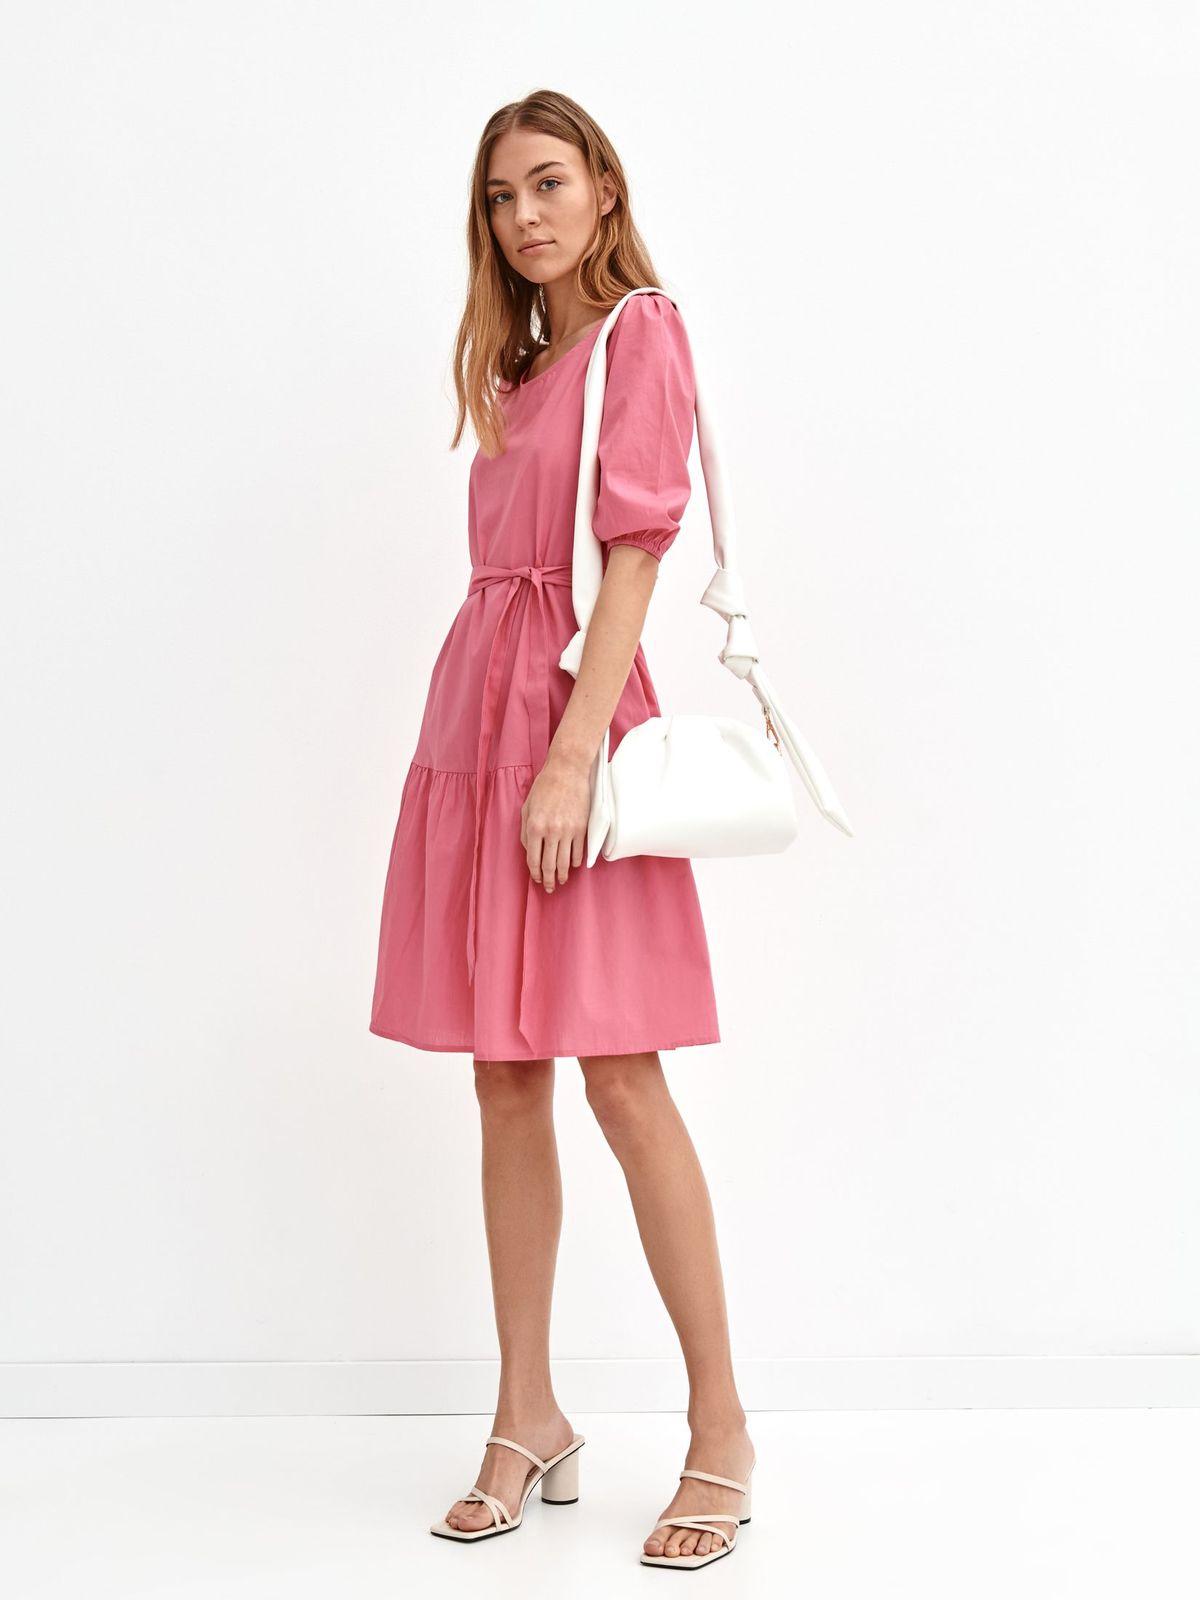 Rochie Top Secret roz din bumbac cu croi larg midi cu cordon detasabil